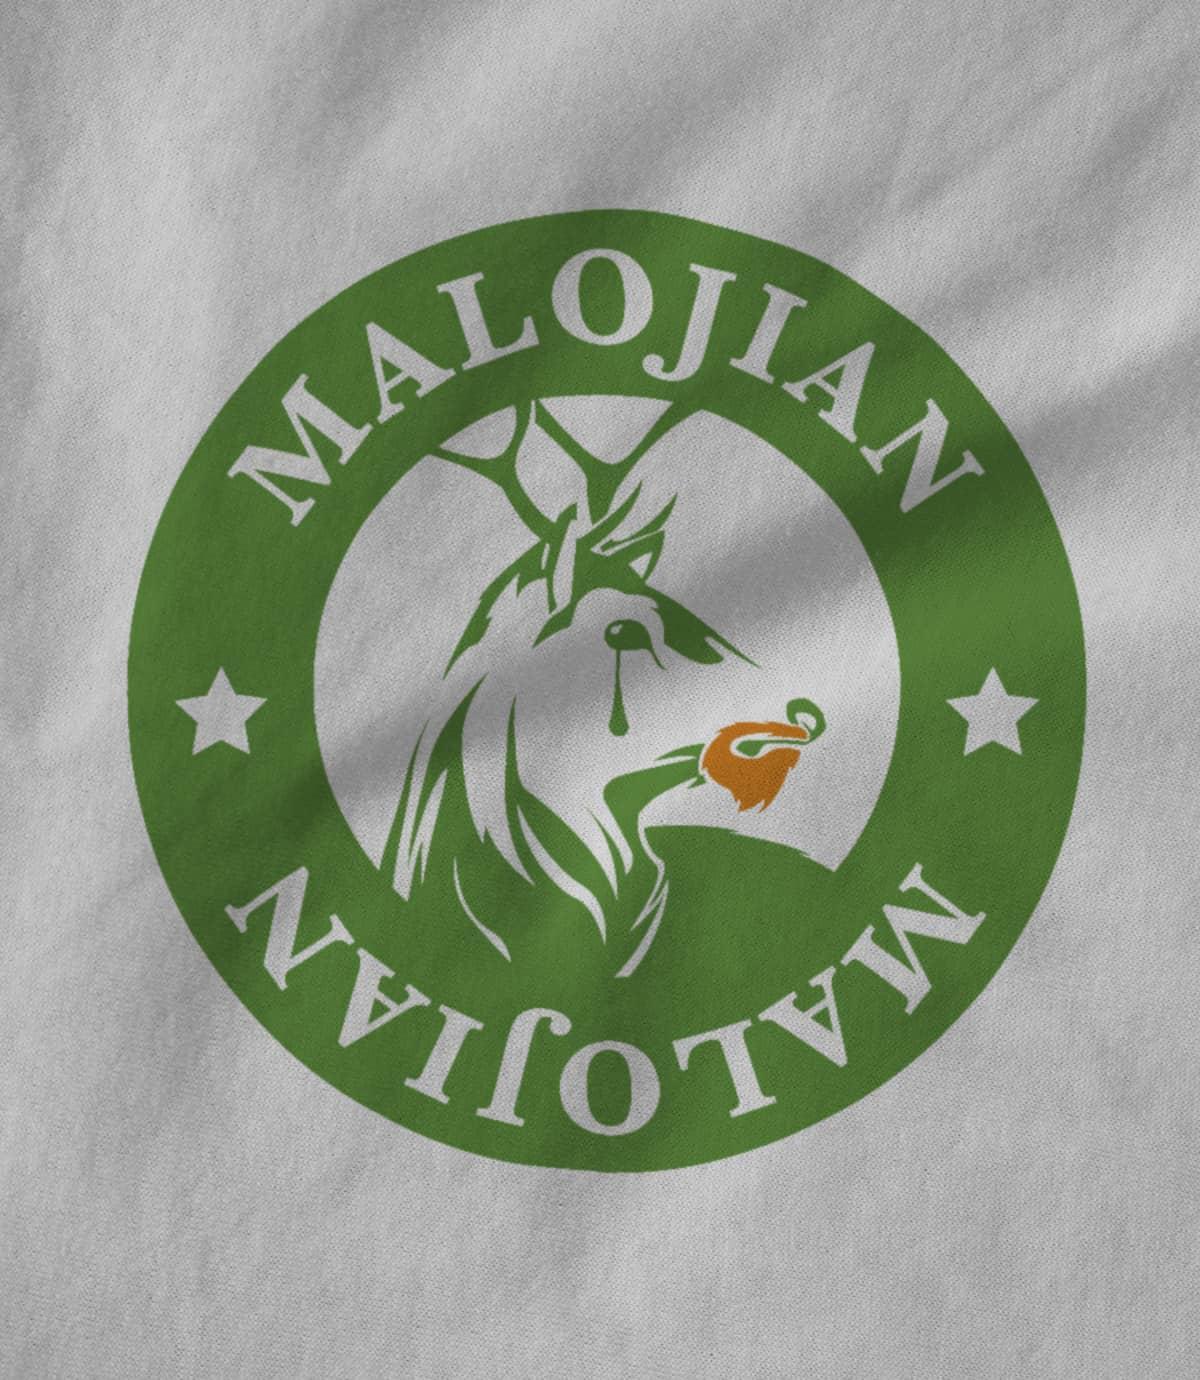 Malojian